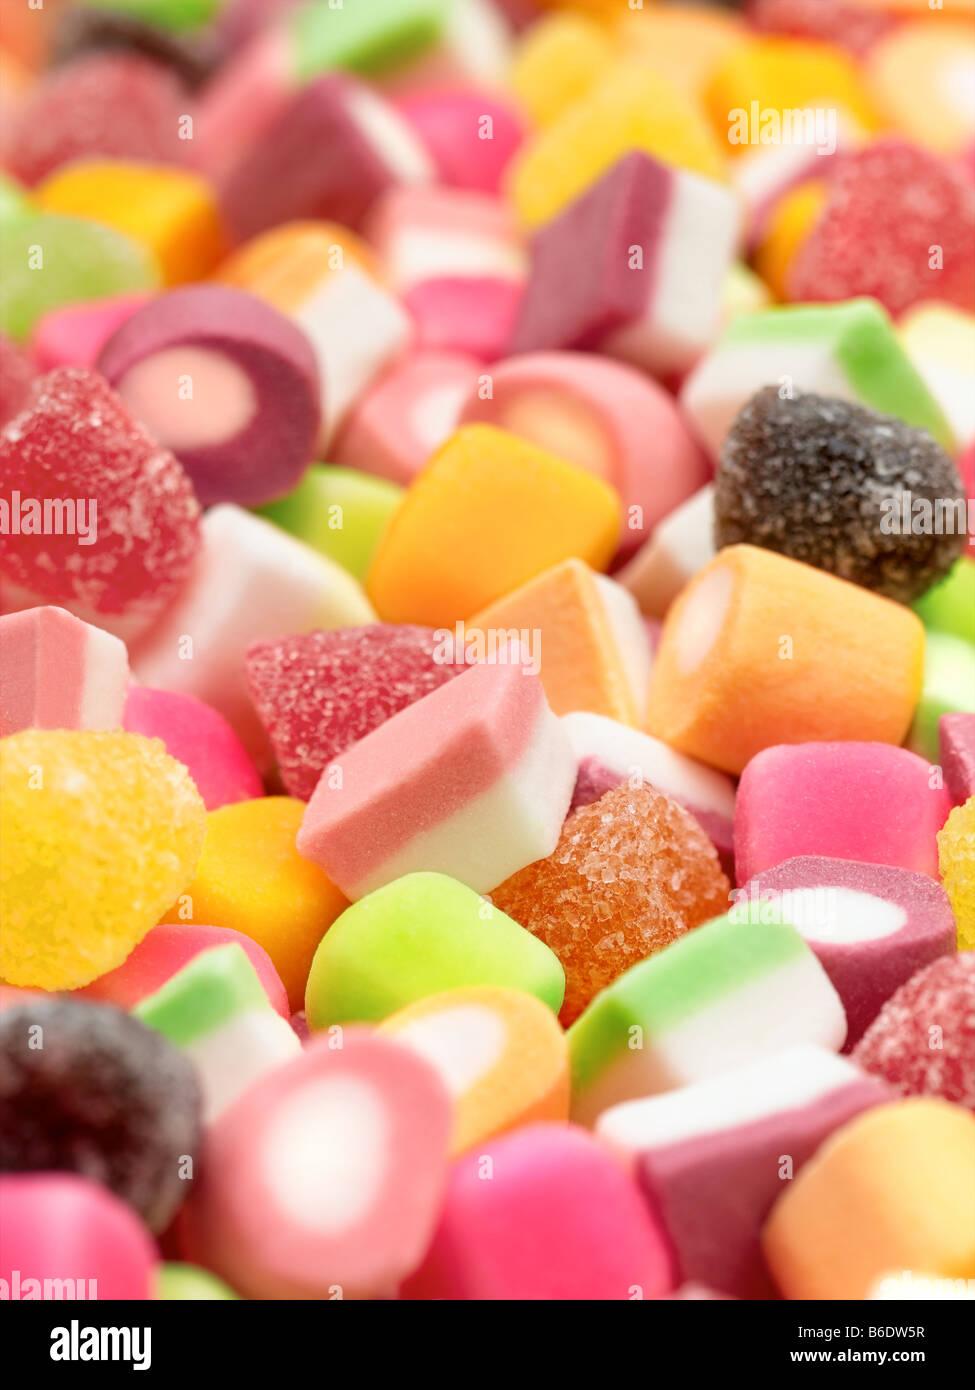 Dolly Mixtures Stock Photo